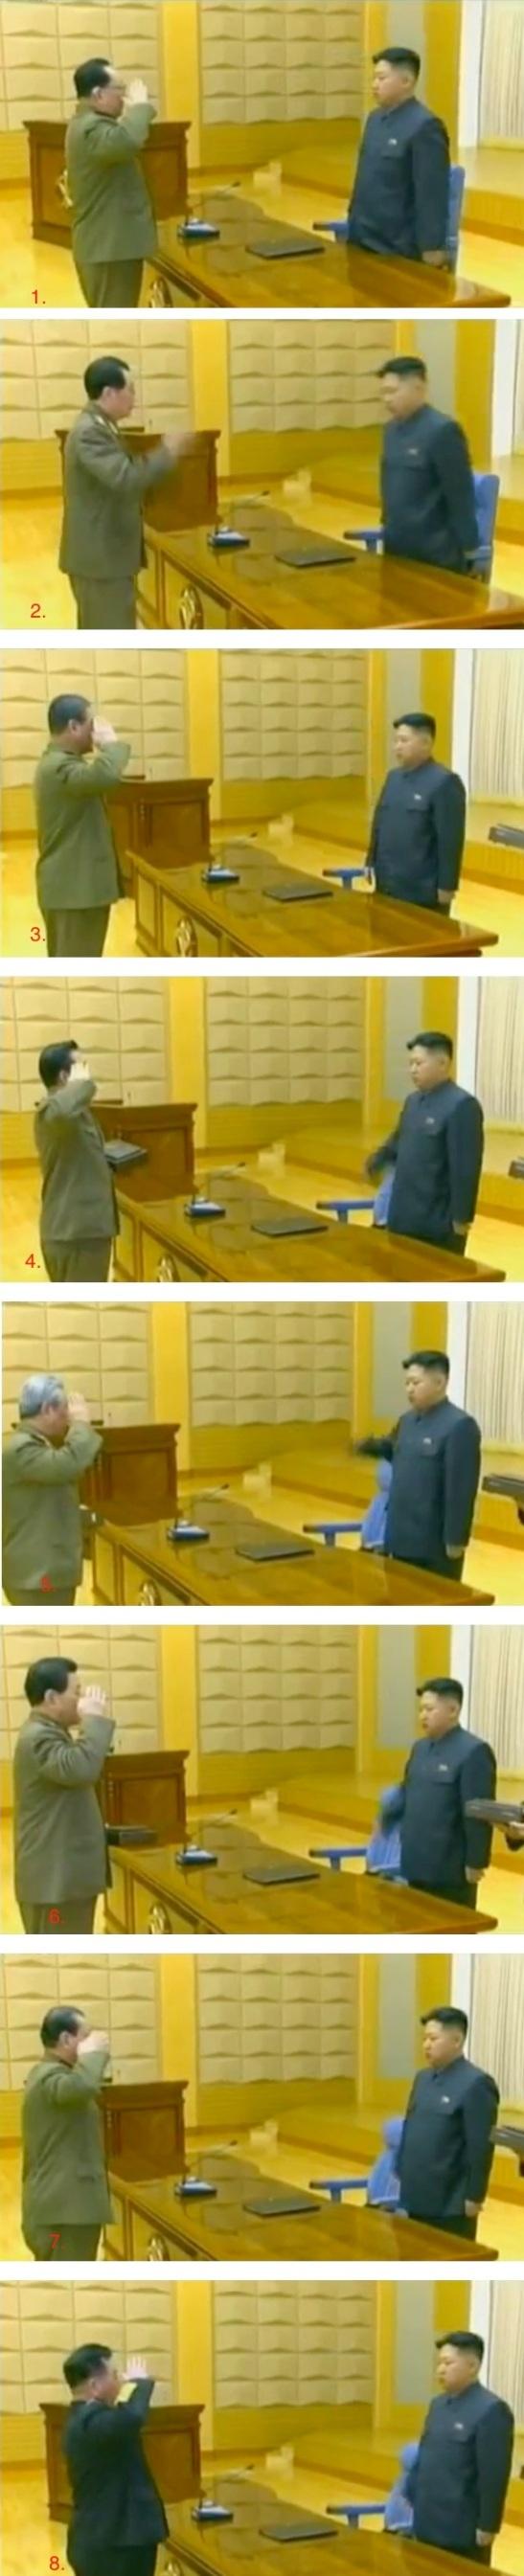 Presentation ceremony of handguns at the end of an expanded CMC meeting held in early 2012.  Among those presented with handguns are: VMar Kim Yong Chun (1.), Jang Song Taek (2.), VMar Kim Jong Gak (3.), Choe Ryong Hae (4.), Ju Kyu Chang (5.), Kim Kyong Ok (6.), Gen. Kim Won Hong (7.) and Gen. Jong Myong Do (8.) (Photos: KCTV screengrabs)